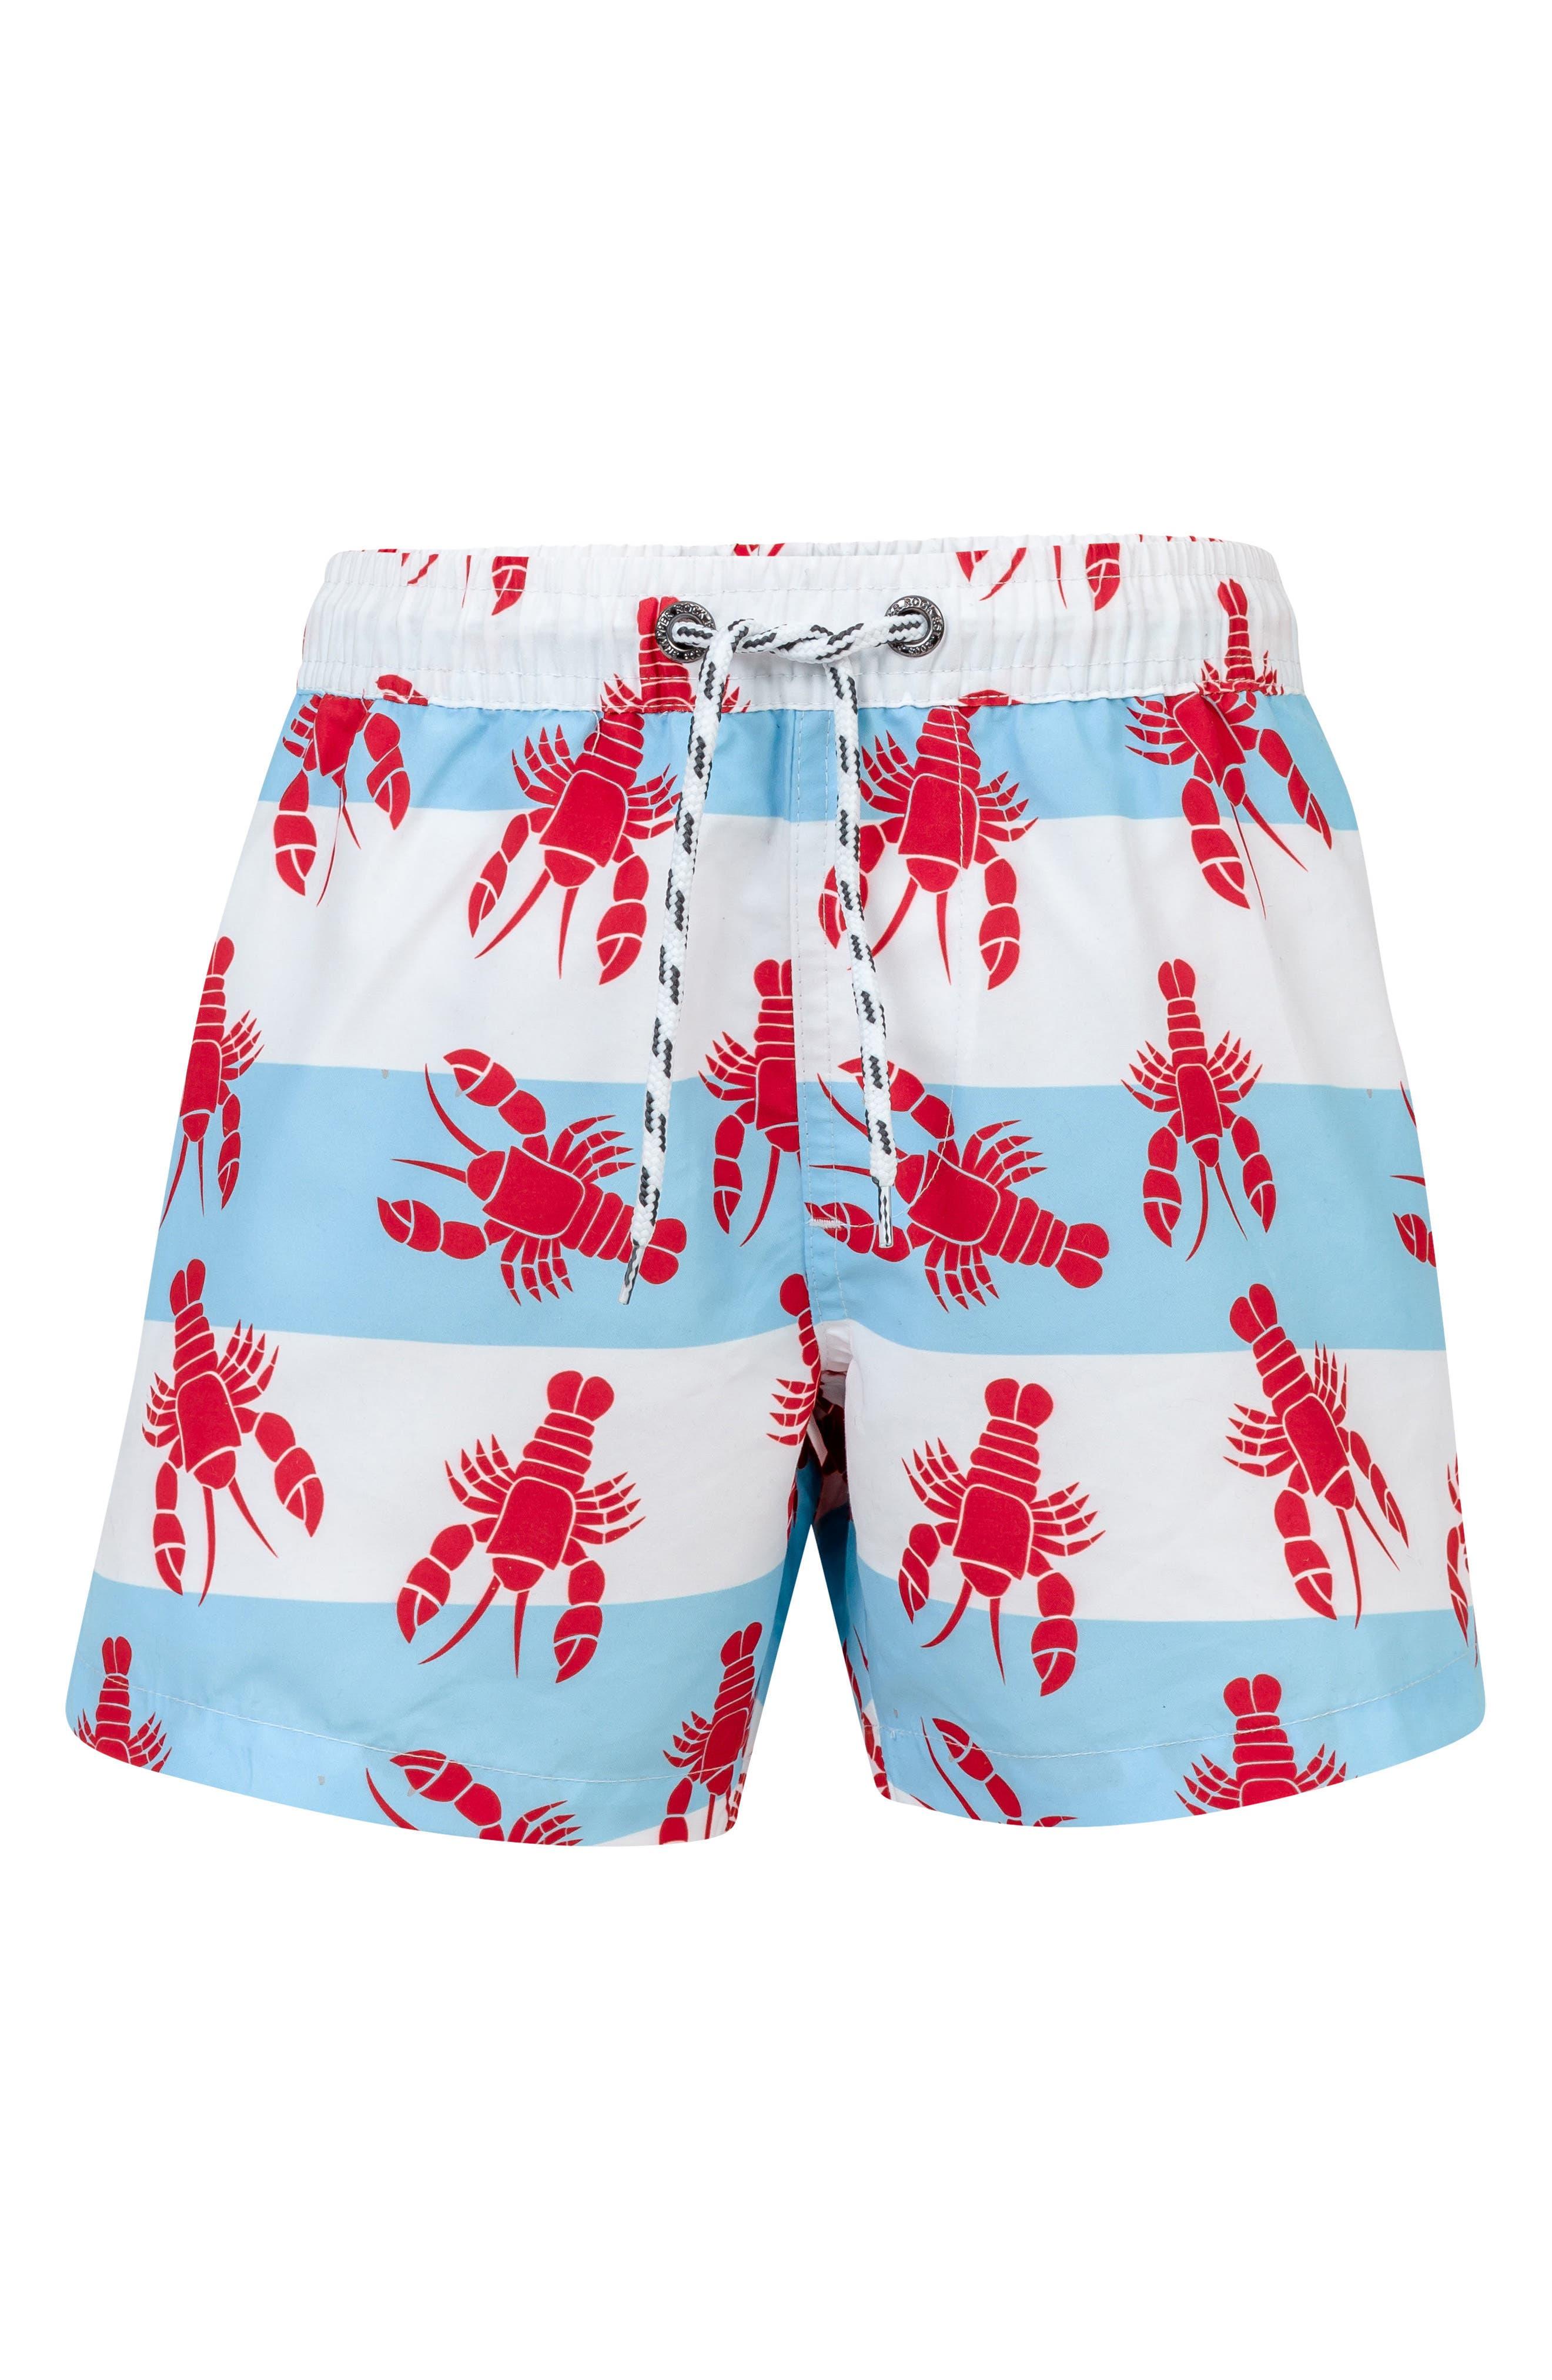 Lobster Board Shorts,                             Main thumbnail 1, color,                             White Aqua Stripe